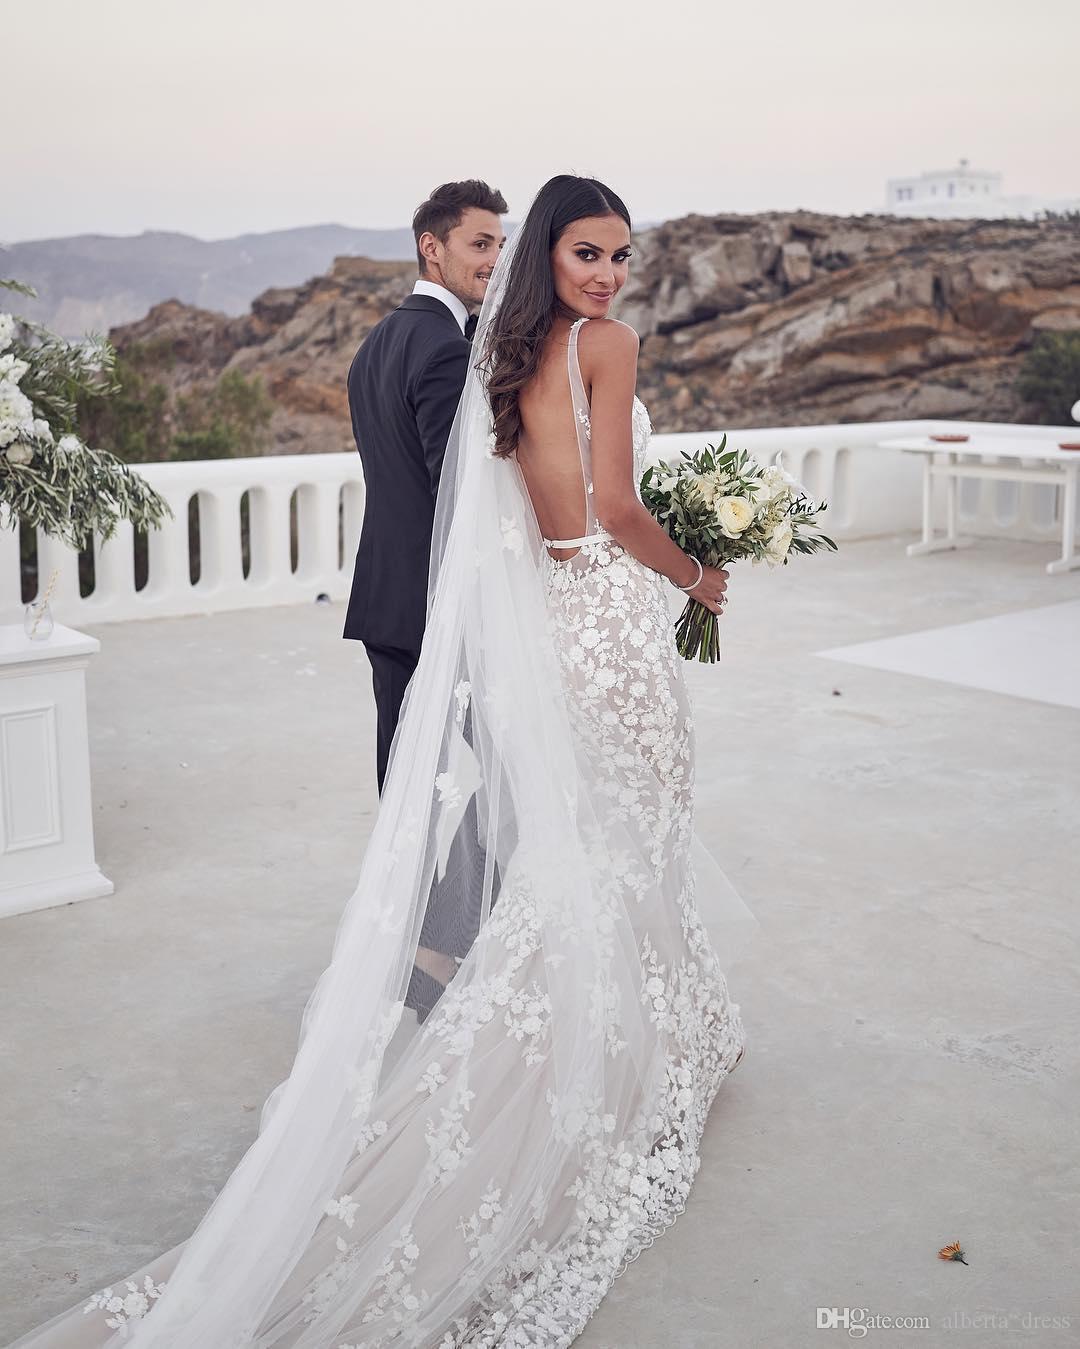 Risque Wedding Dress Photos: Backless Mermaid Beach Wedding Dresses 2020 V Neck 3D Lace